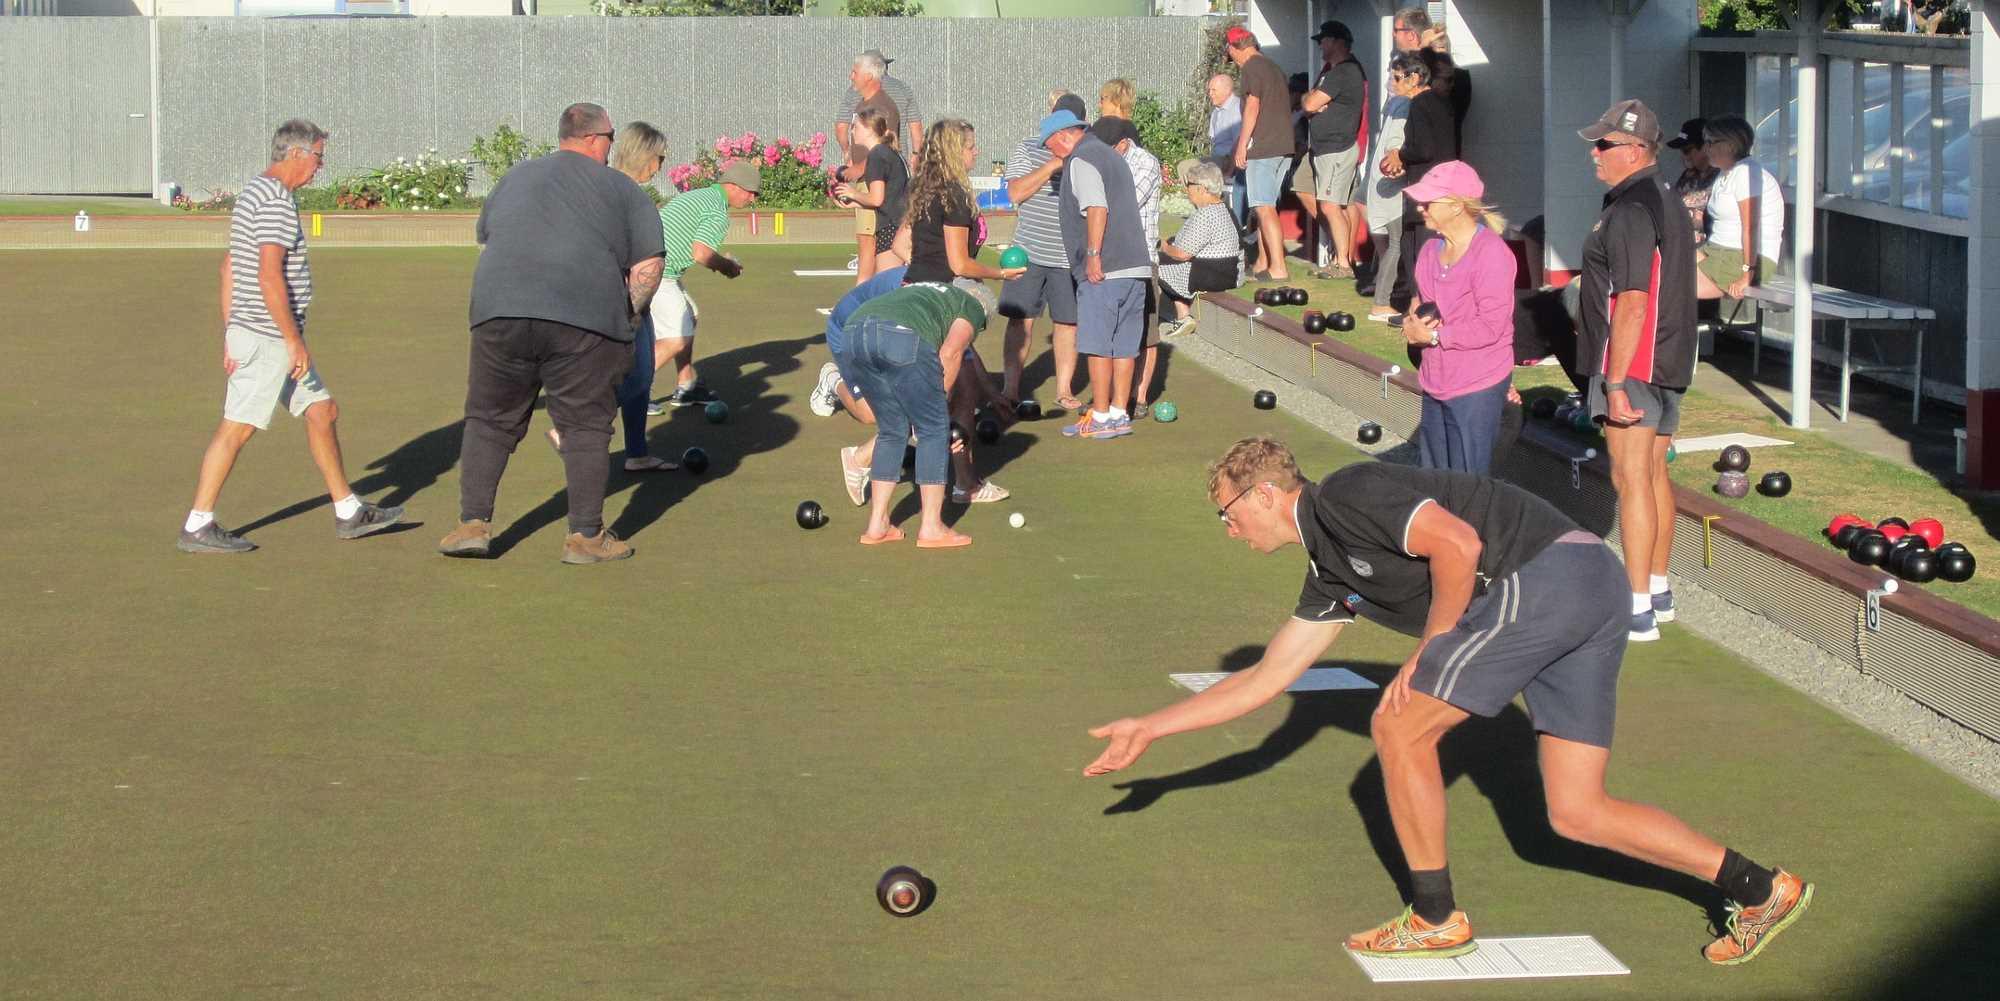 Community Bowls 24 Feb 2020 - Photo 4